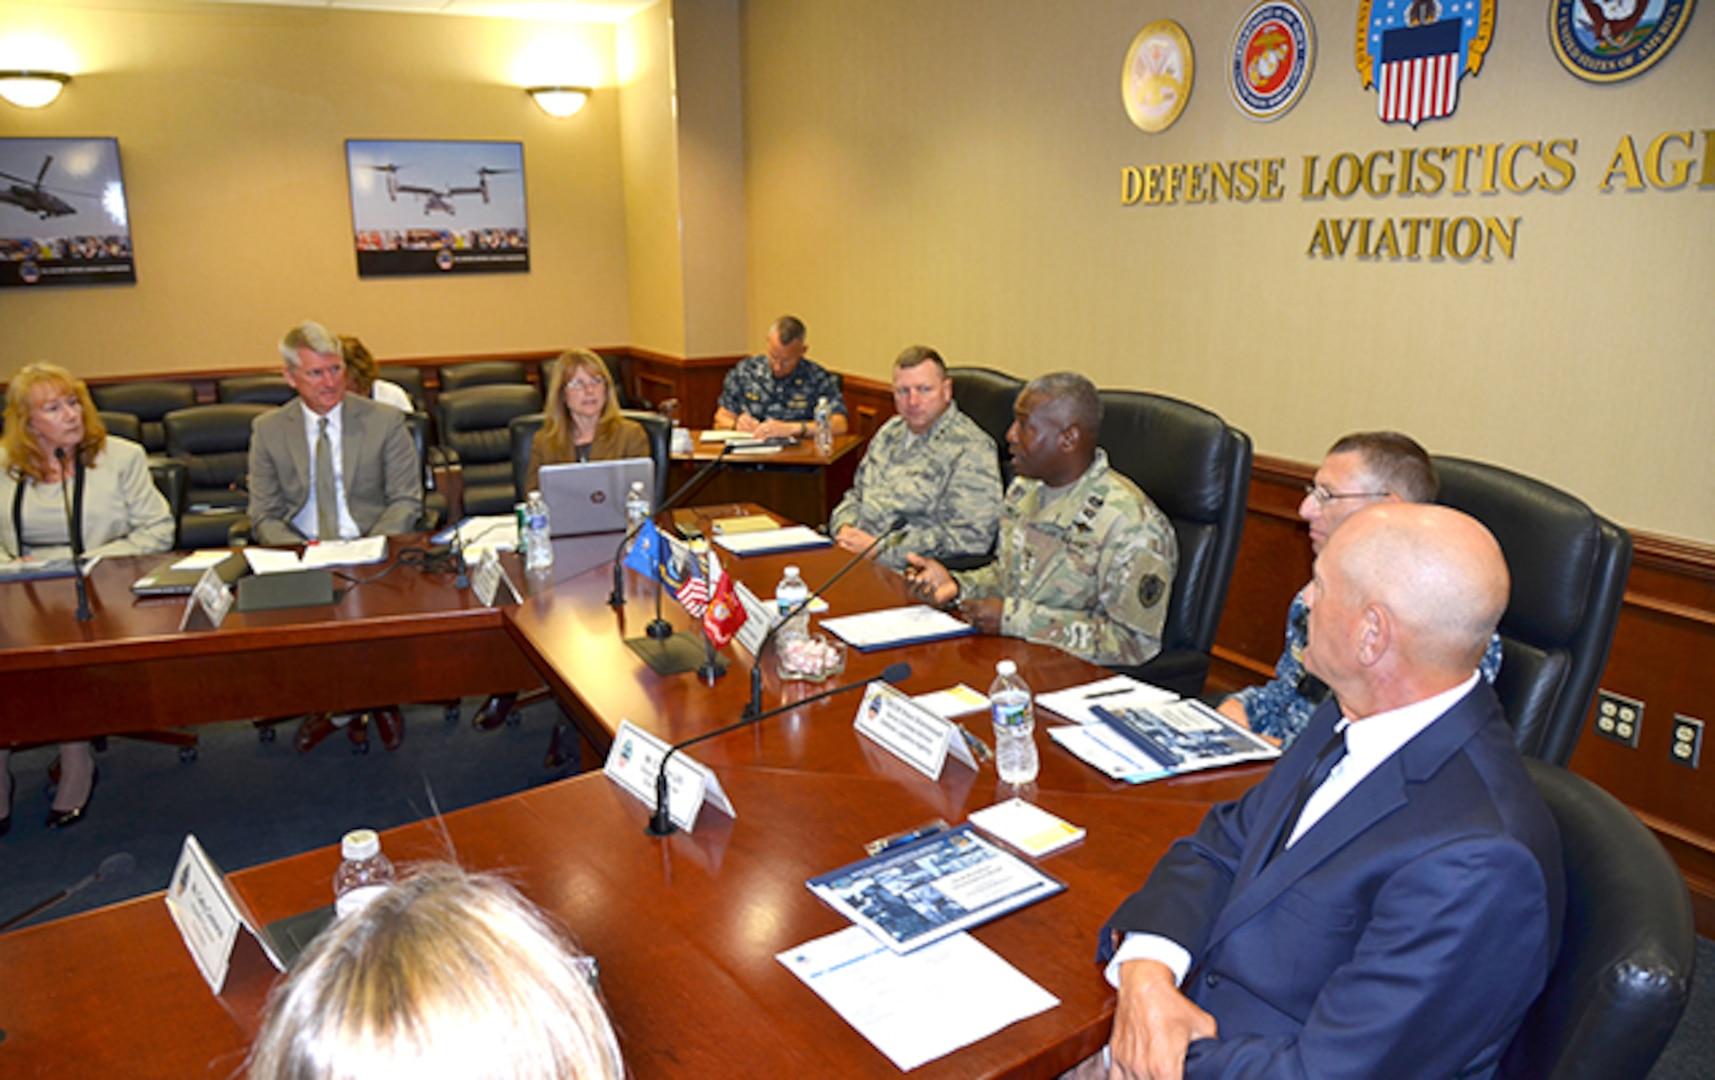 DLA directors receives DLA Aviation overview